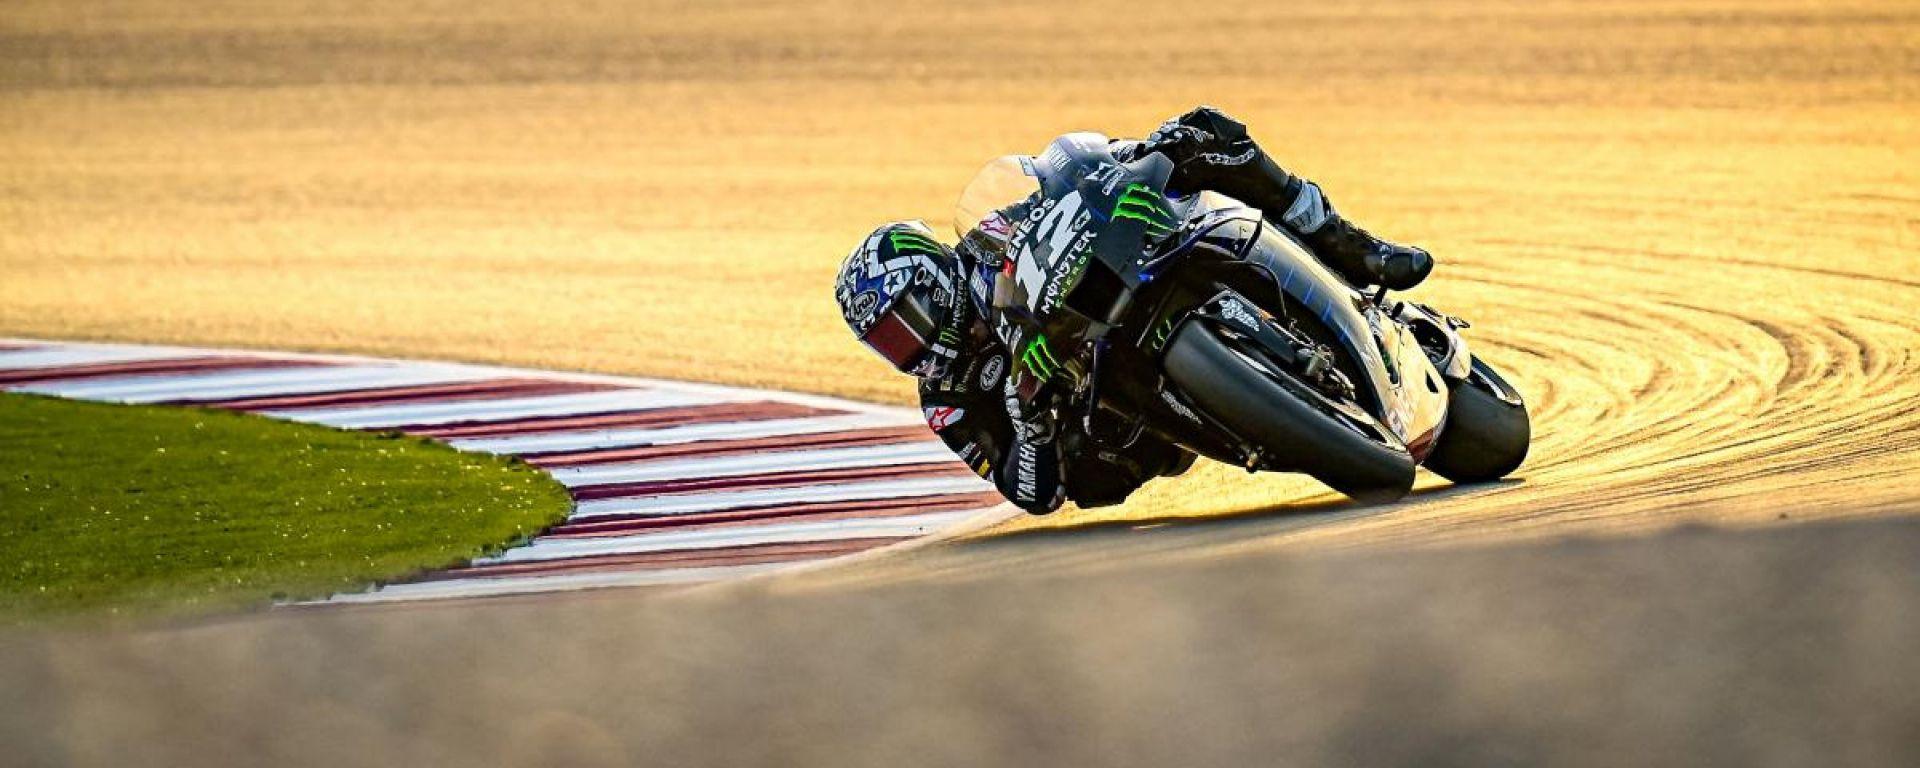 MotoGP Test Losail, day 4: tris Yamaha al vertice, Bagnaia quarto